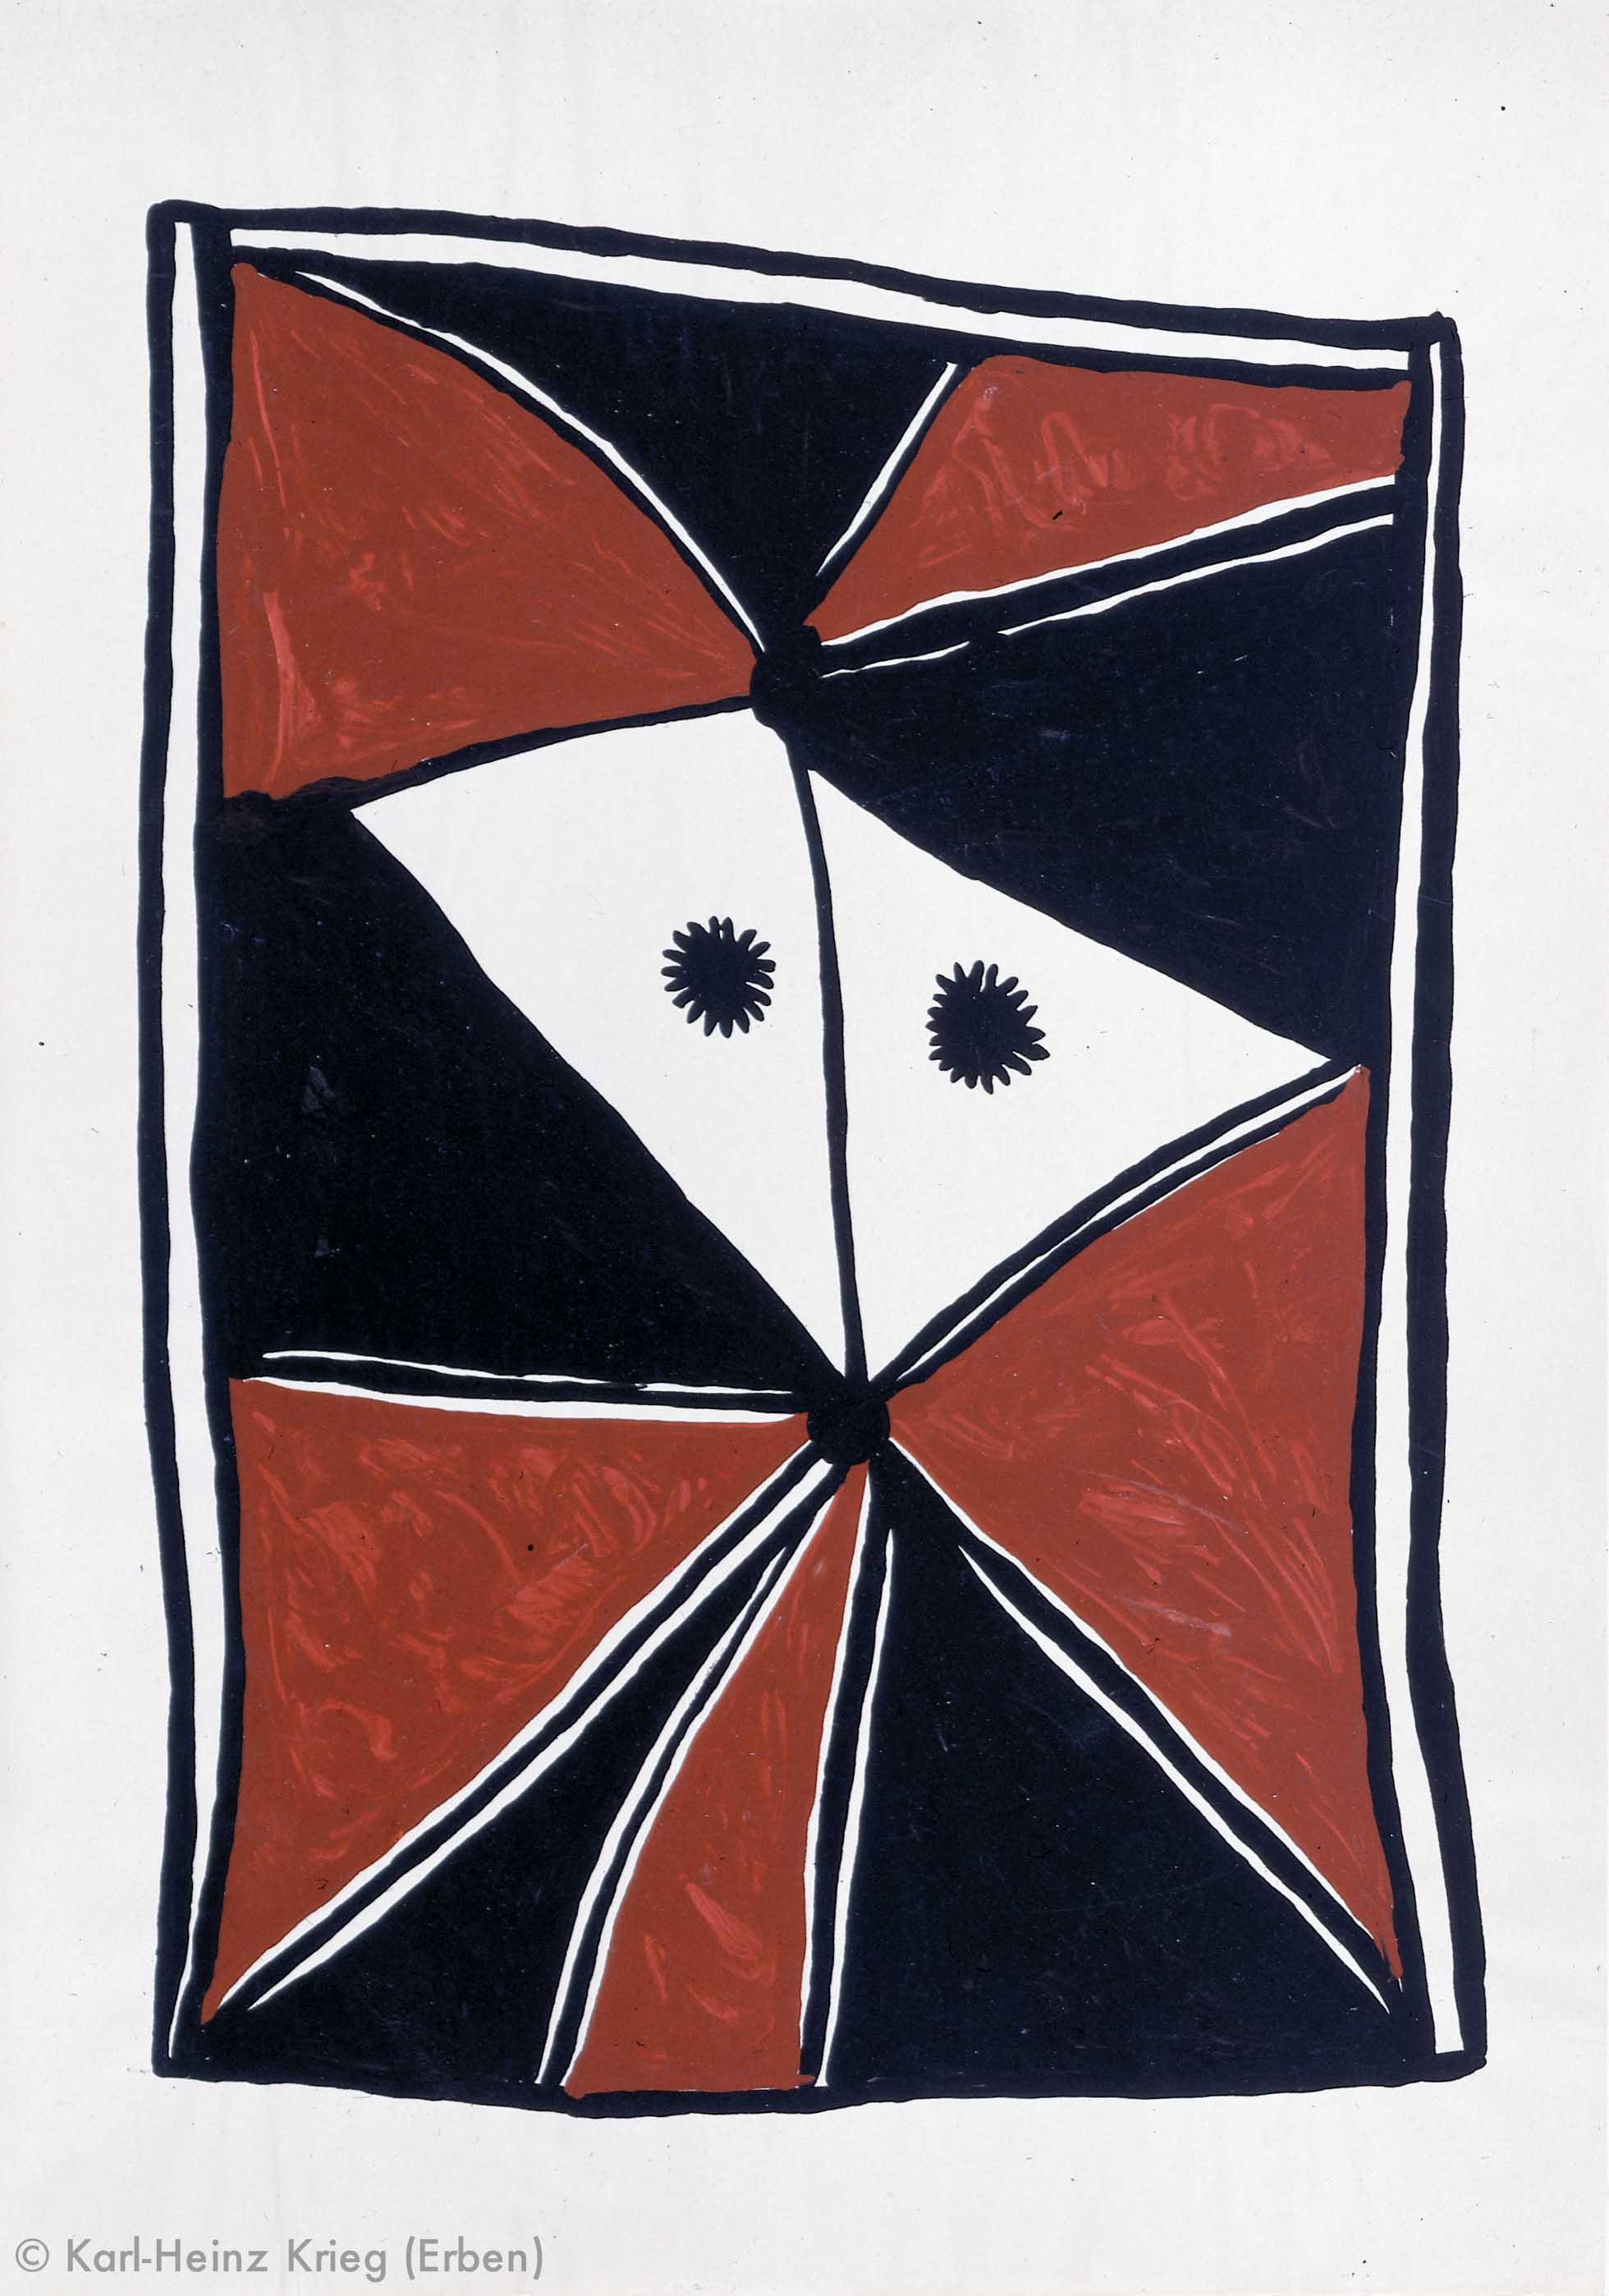 Gaou Béavogi Koiworosegué, 1989 Dispersionsfarbe/Papier 59,5 x 42 cm Werknr. 6-1989/39